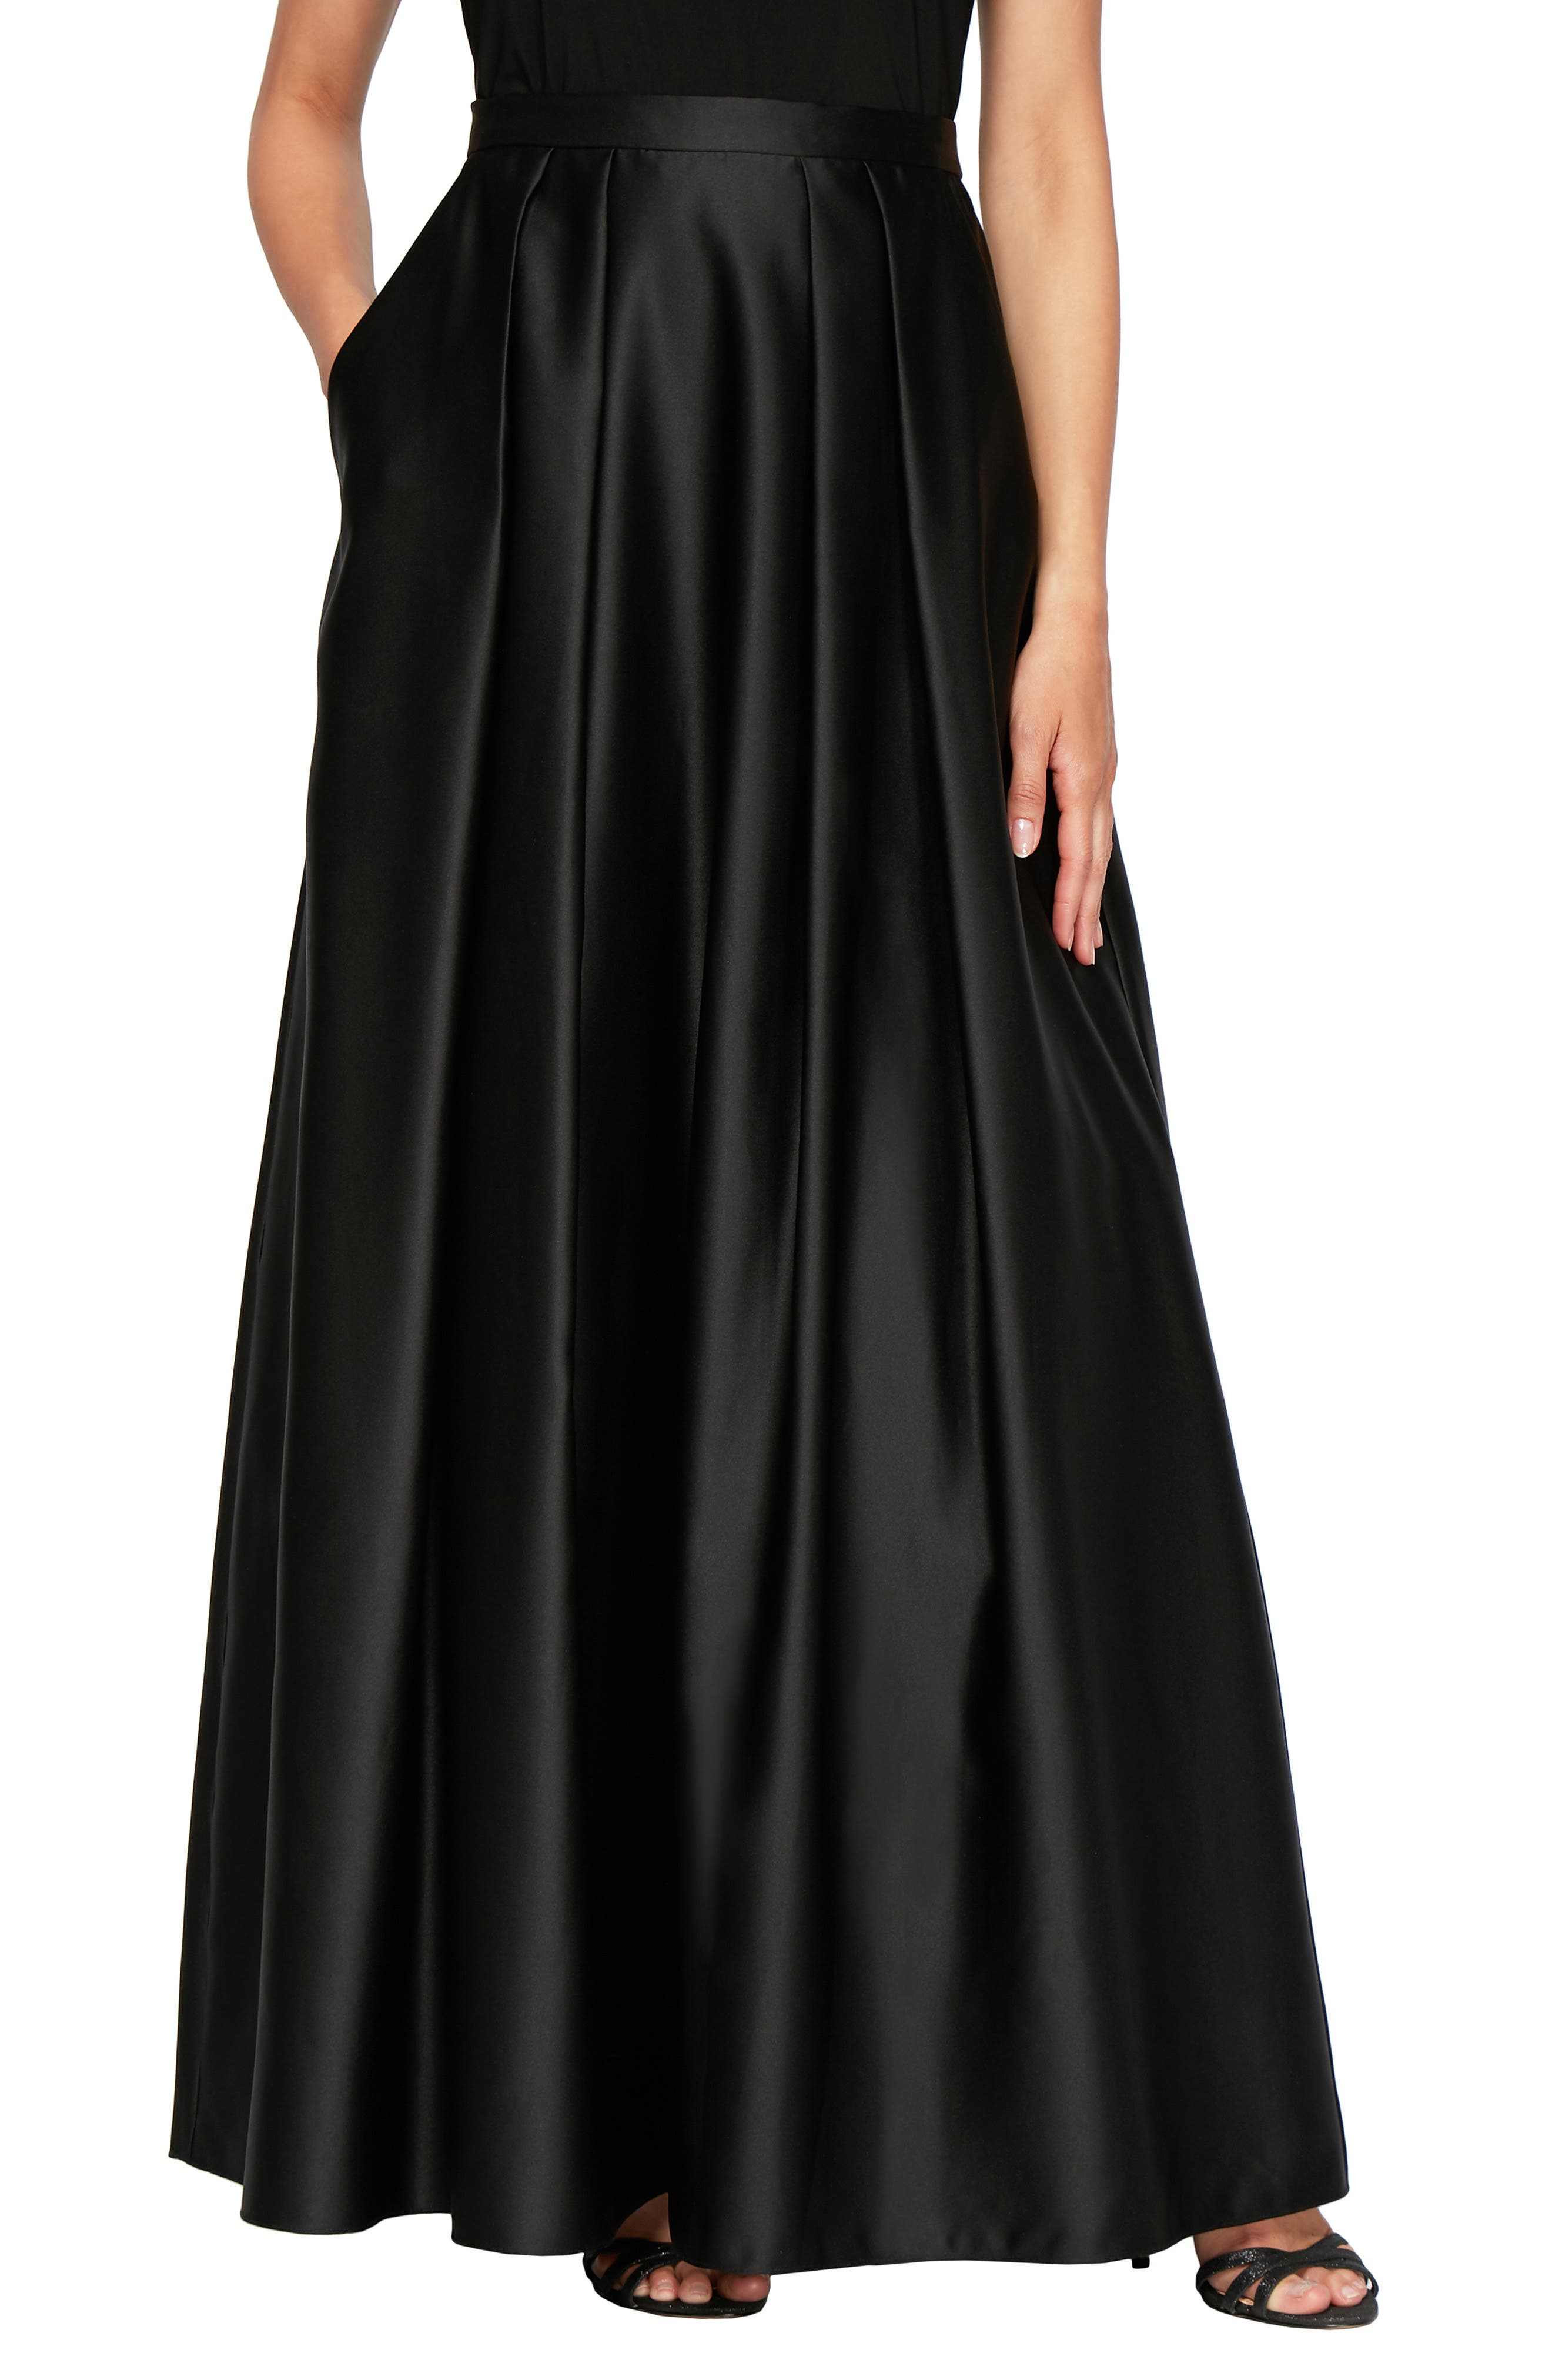 Satin Ball Skirt